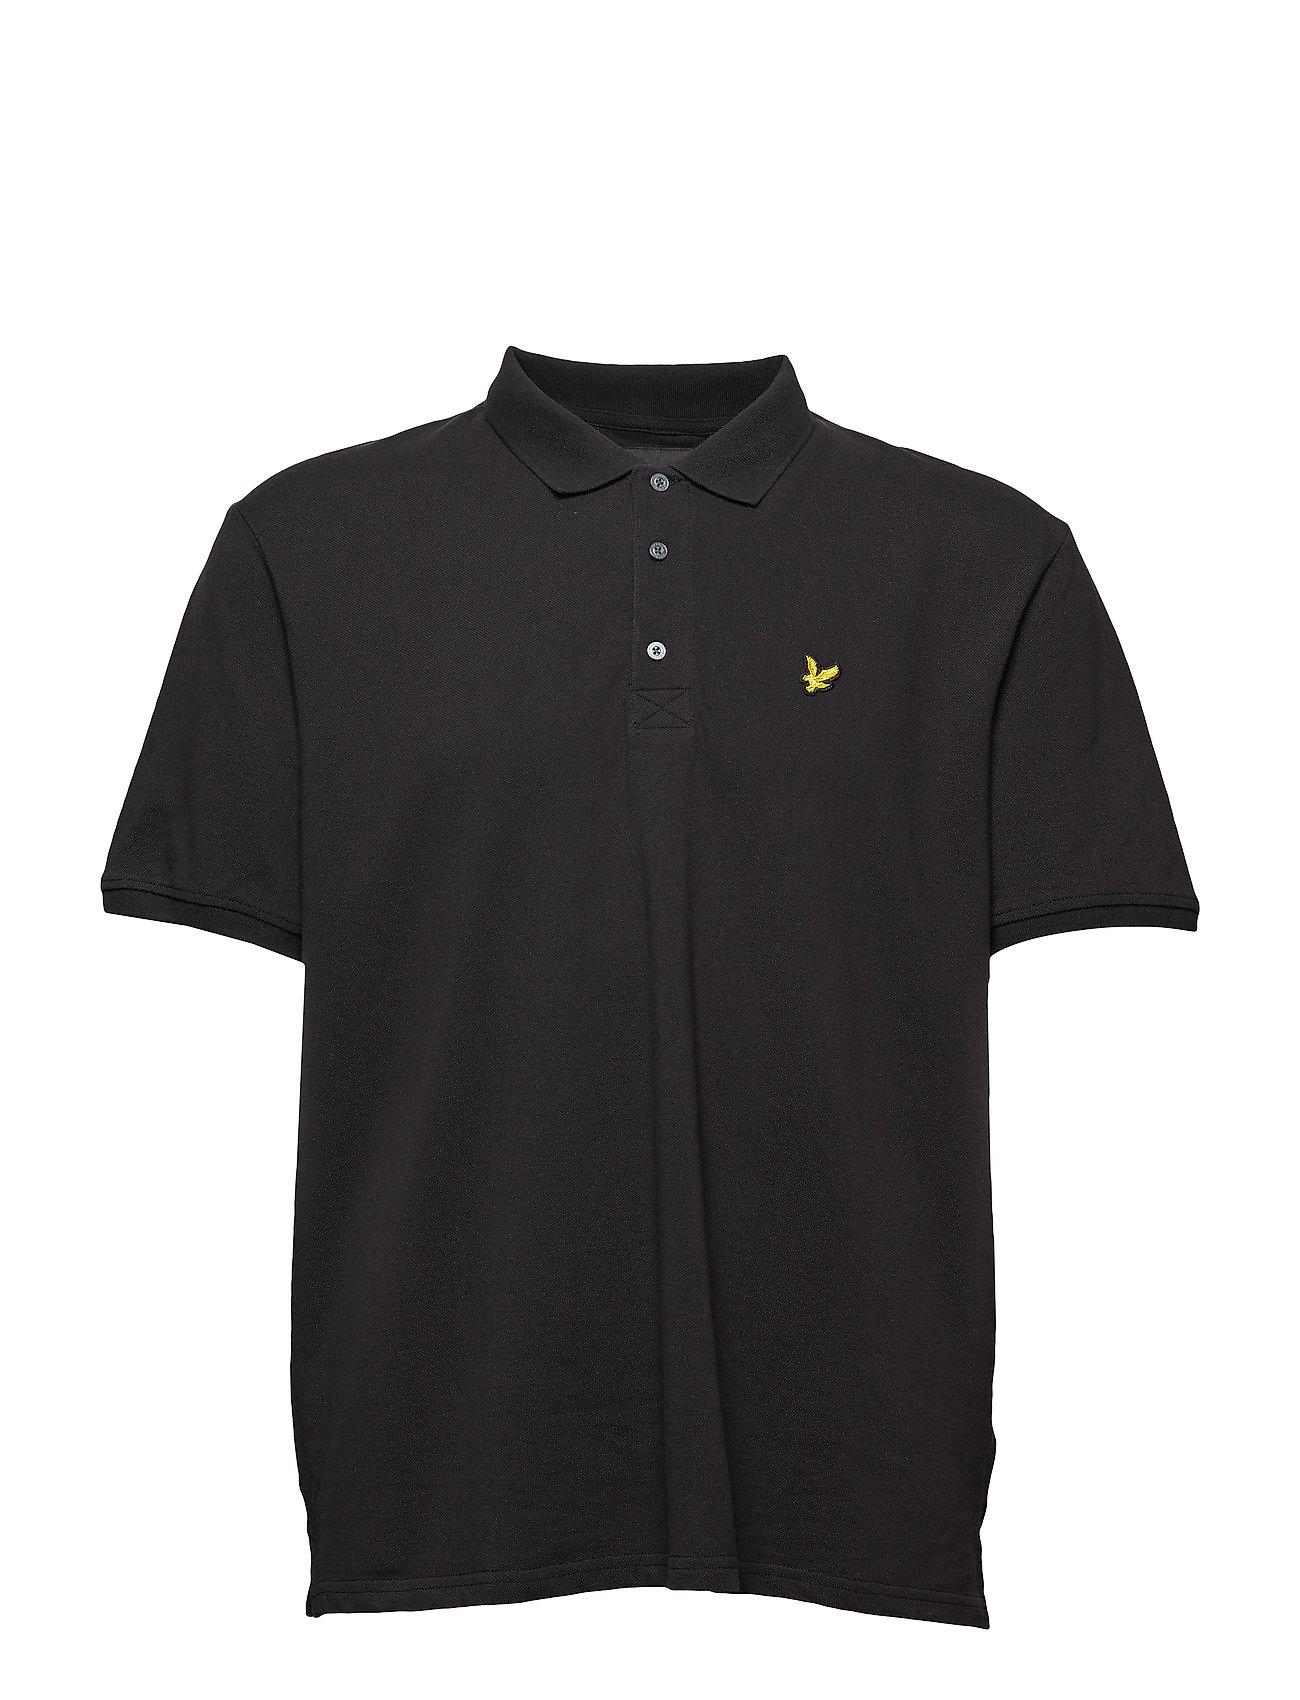 Lyle & Scott Plain Polo Shirt - TRUE BLACK